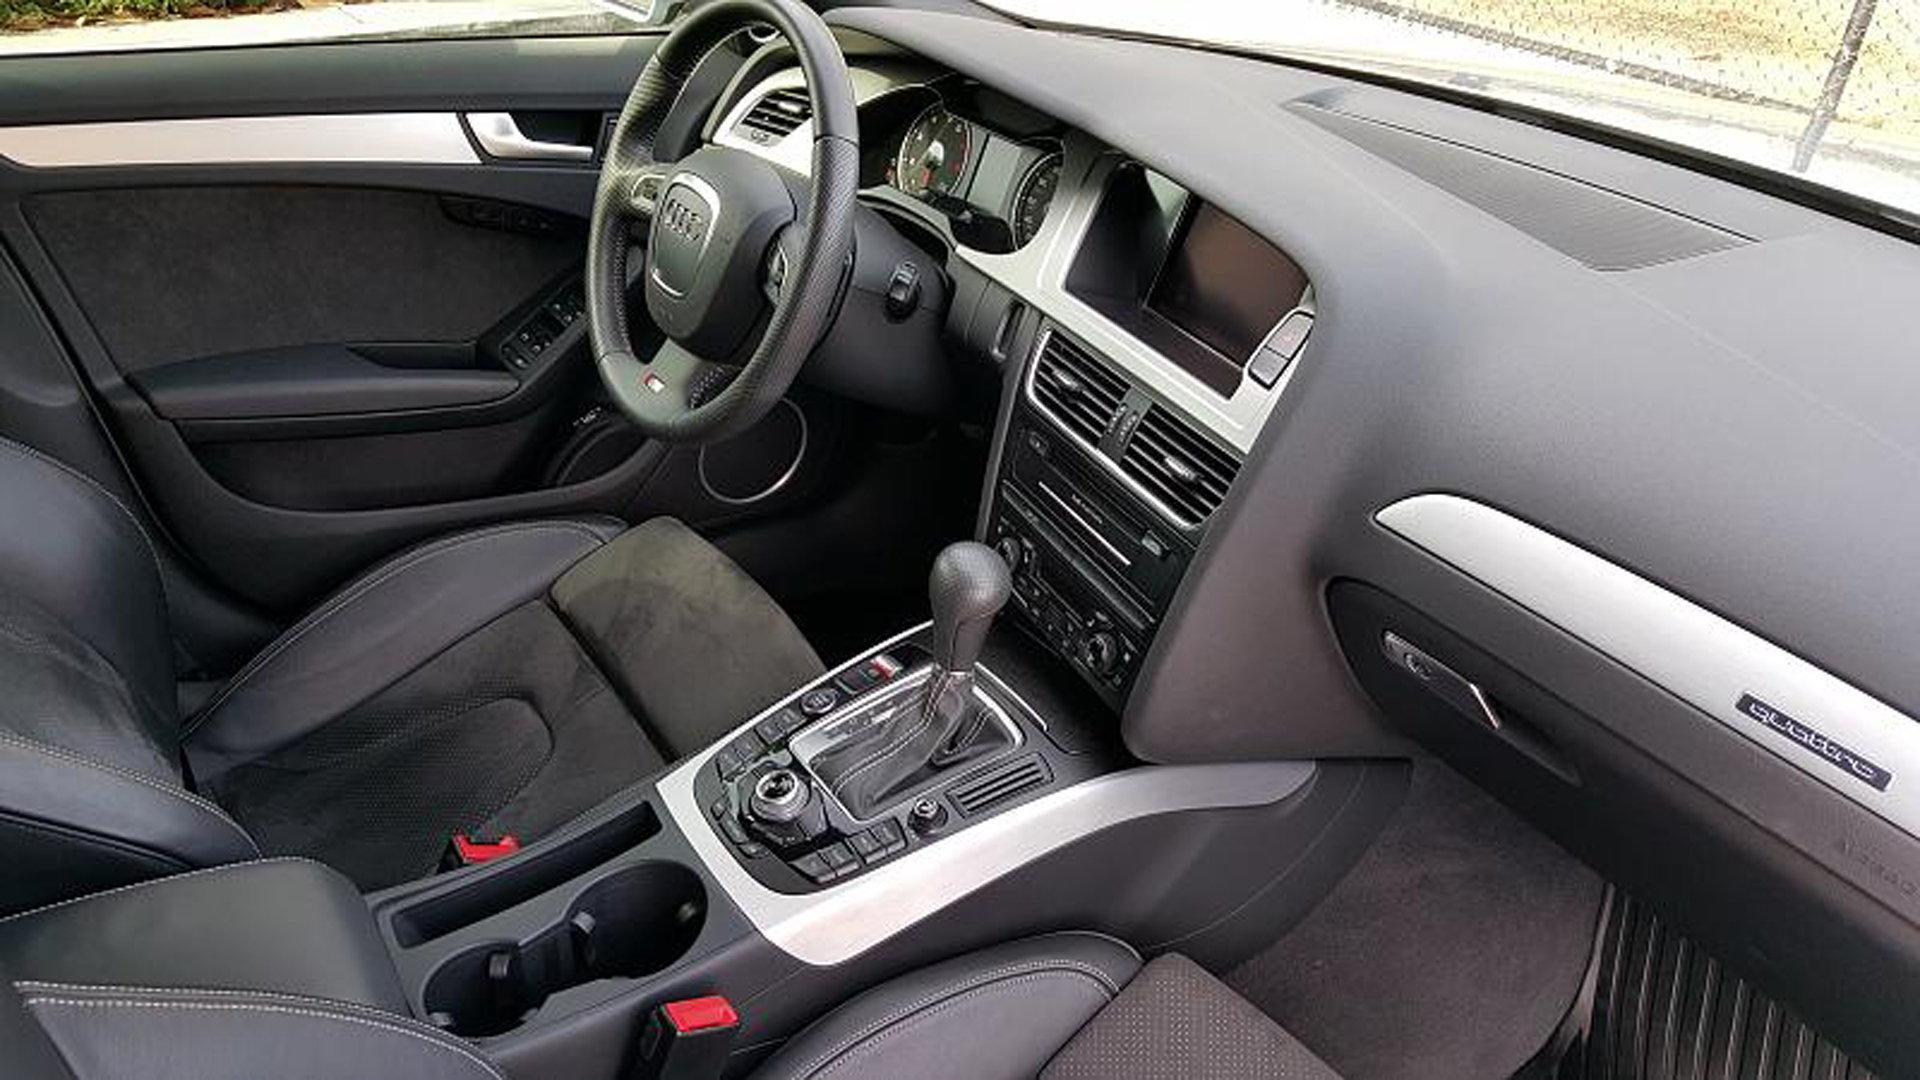 Kelebihan Kekurangan Audi Multitronic Murah Berkualitas